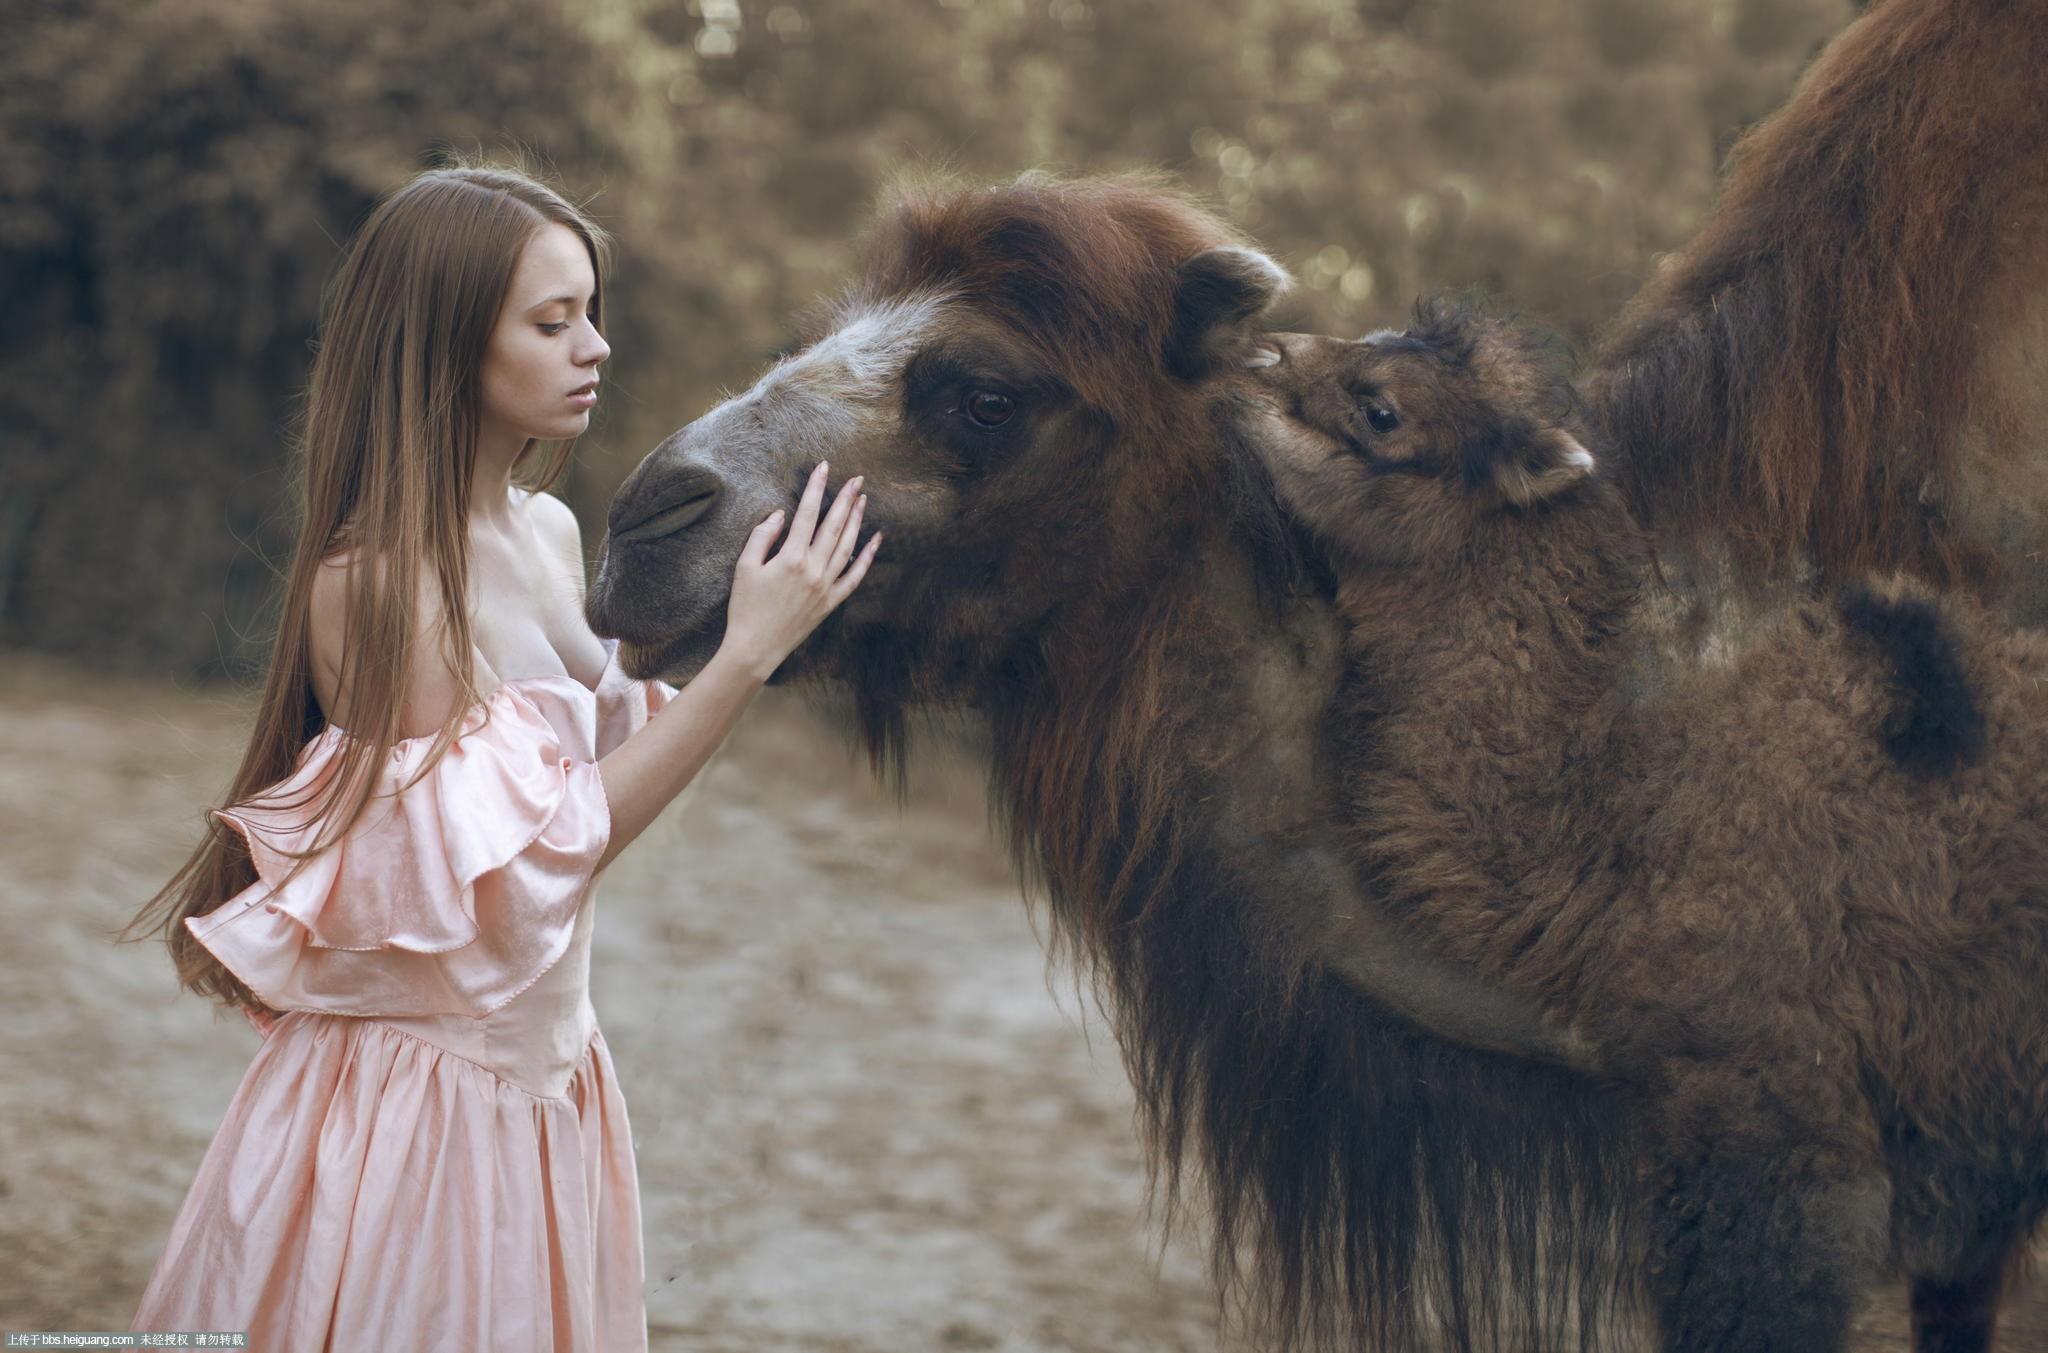 zooskool与动物 zooskool女人与猴子 zooskool人与动物图片 实时关注